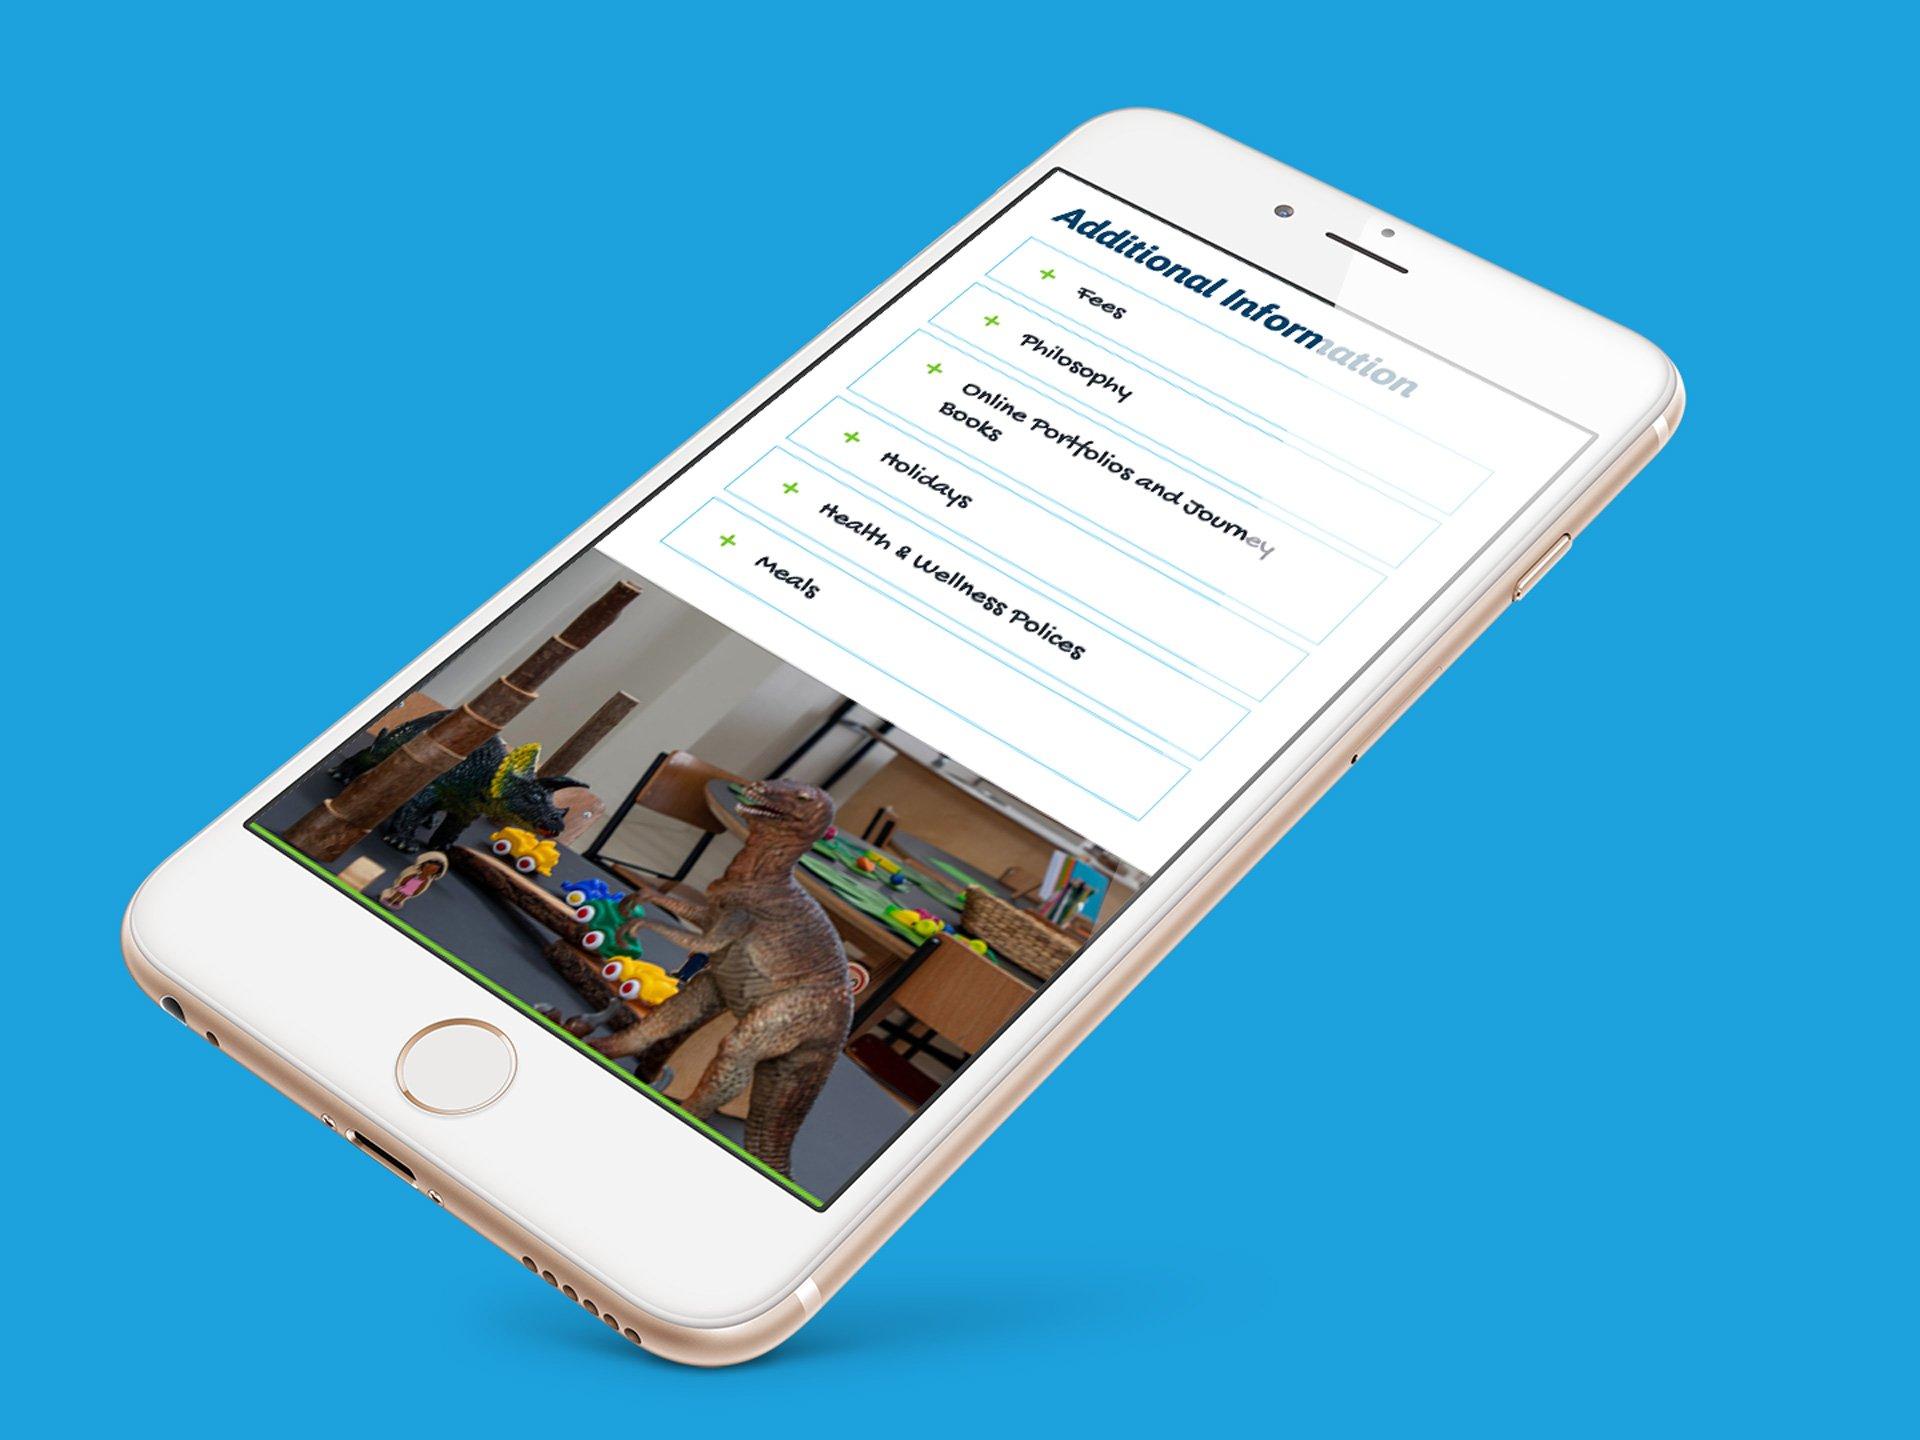 piccolo park mobile friendly website design 02